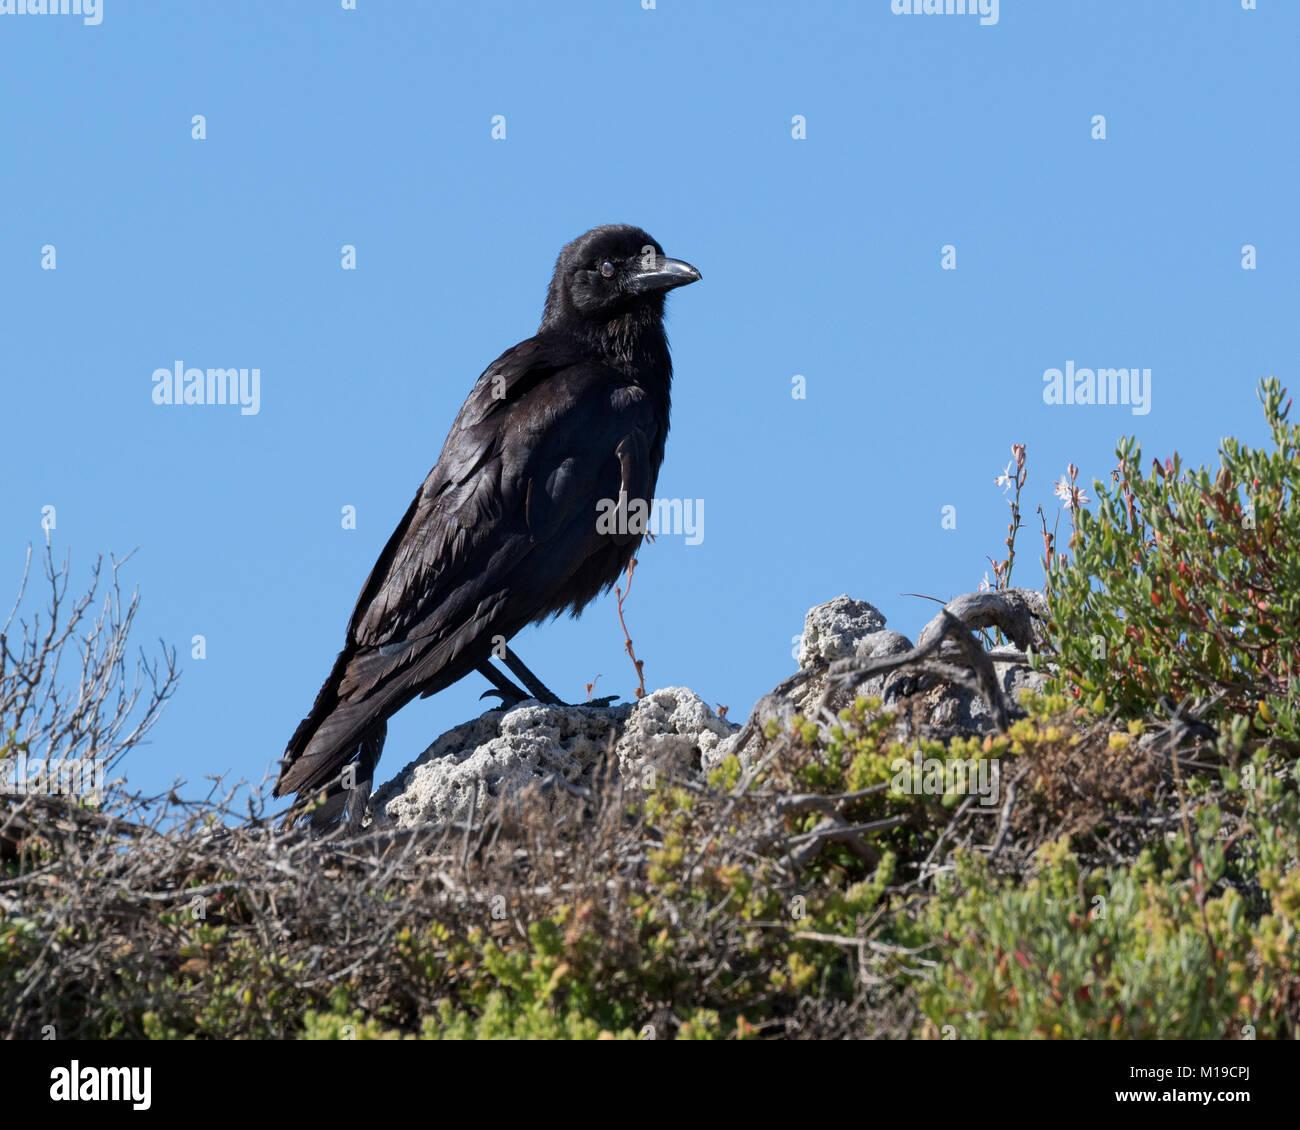 An Australian raven (Corvus coronoides) on Rottnest Island, Perth, Western Australia - Stock Image